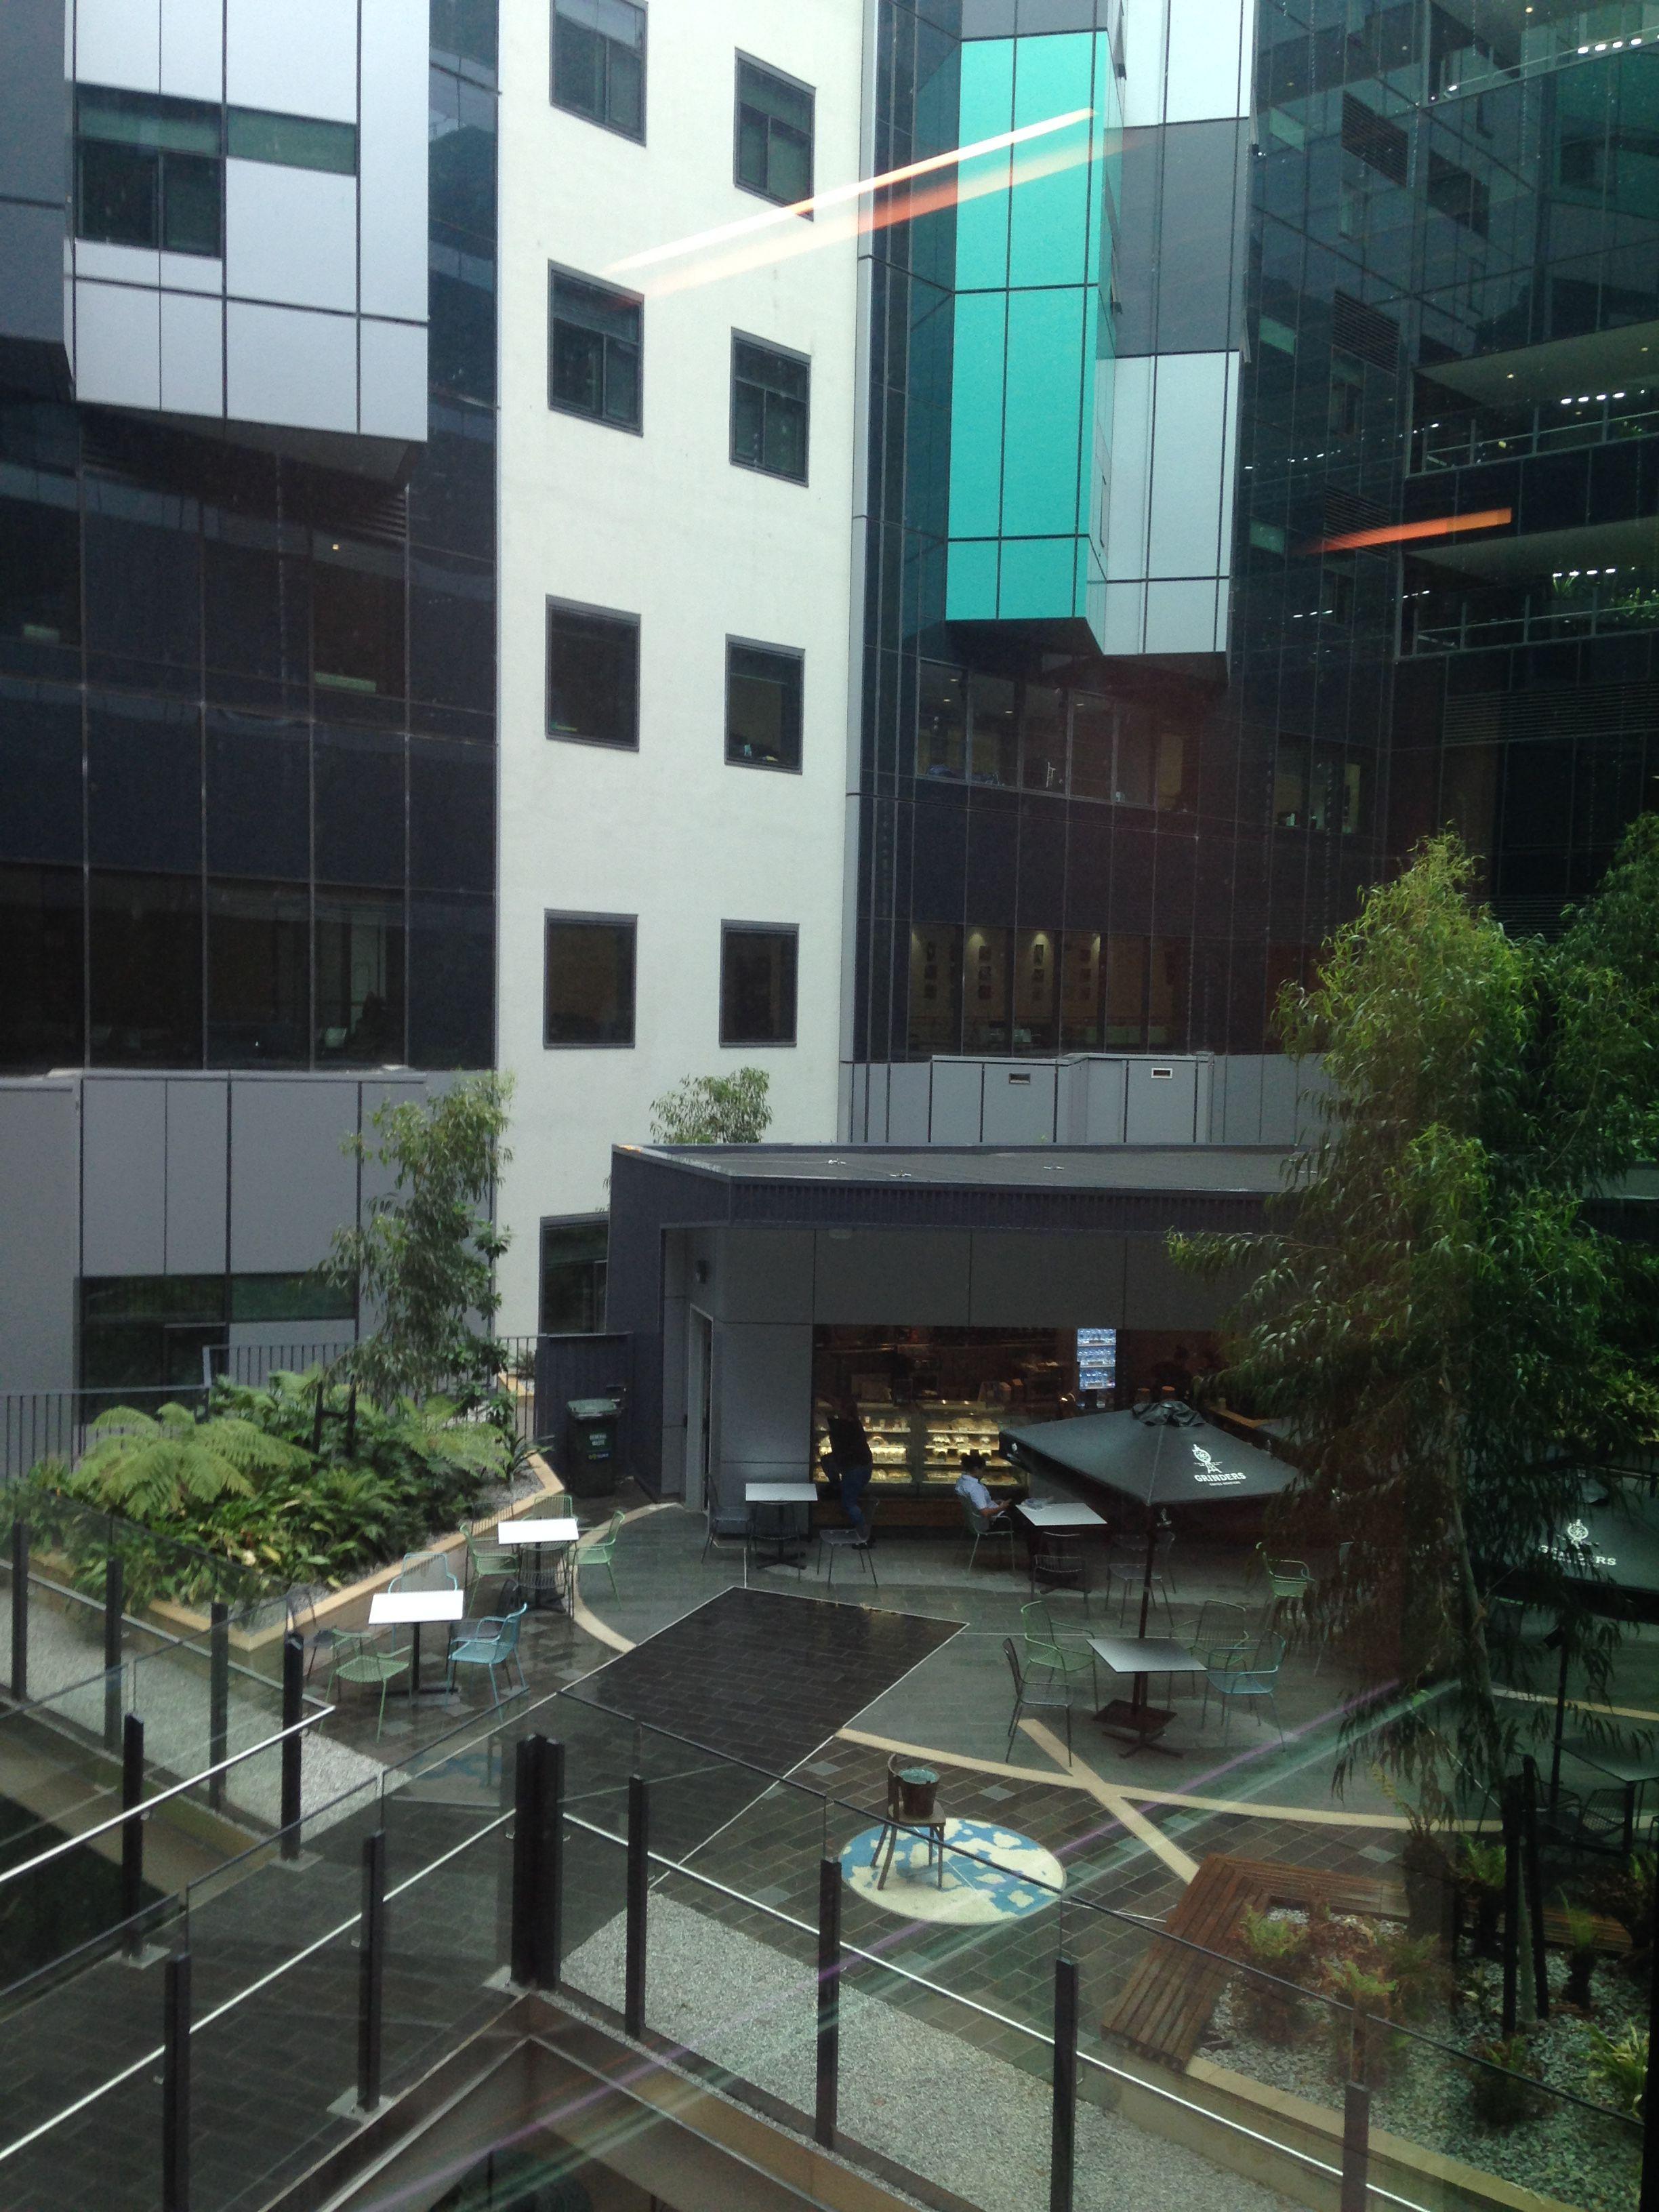 Royal Adelaide Hospital Atrium view from inside   SOUTH